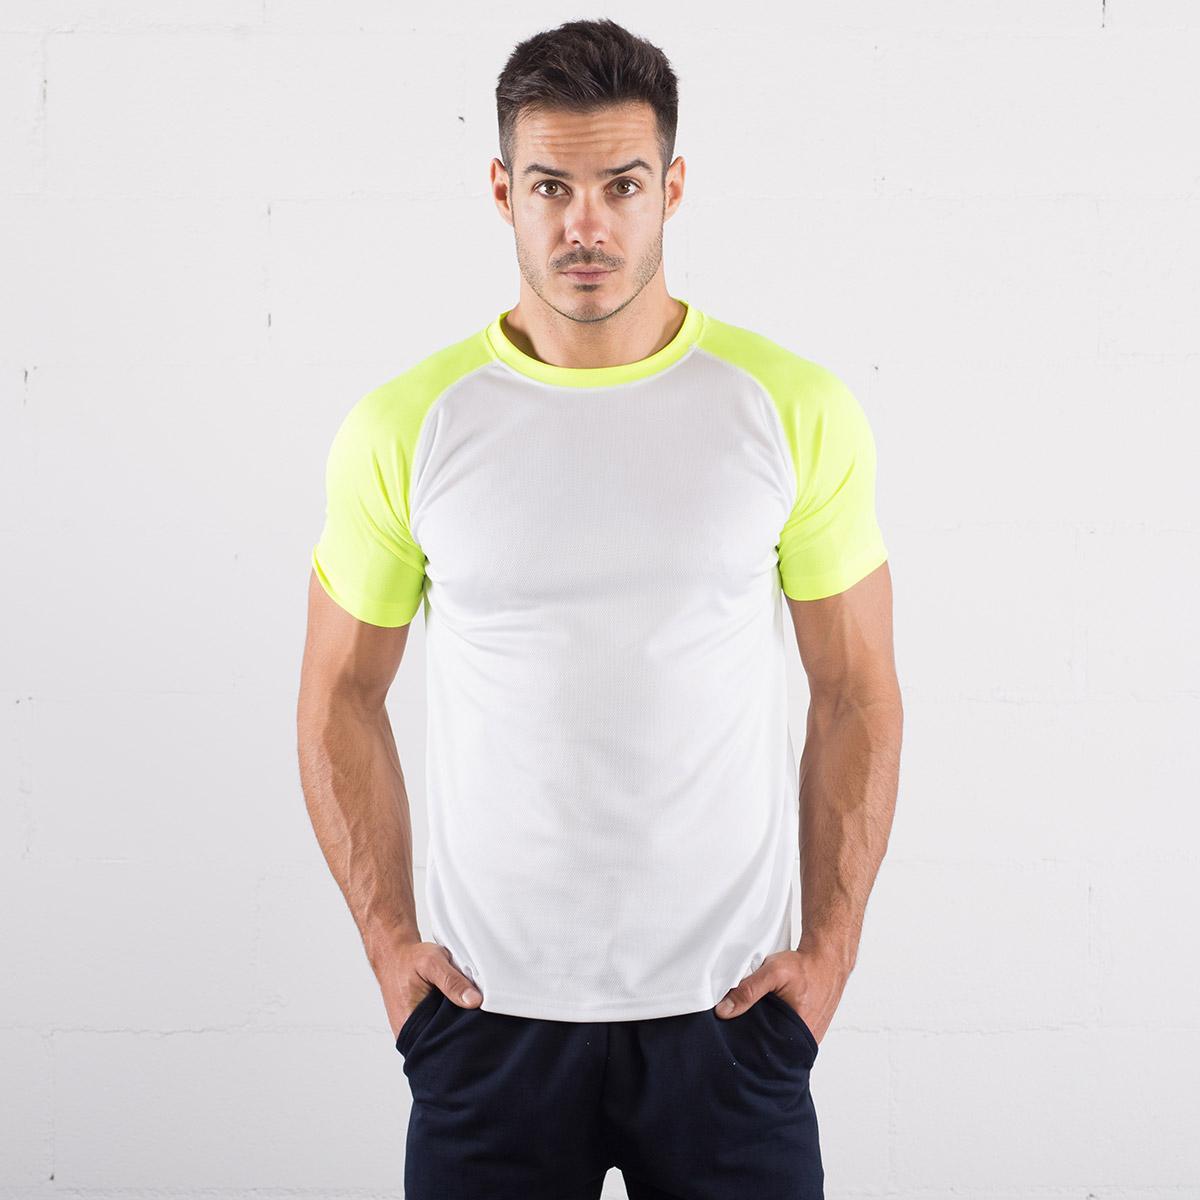 ae89069eabd2 T-shirt Sport Manica Corta Bicolore Sprintex - Vestilogo